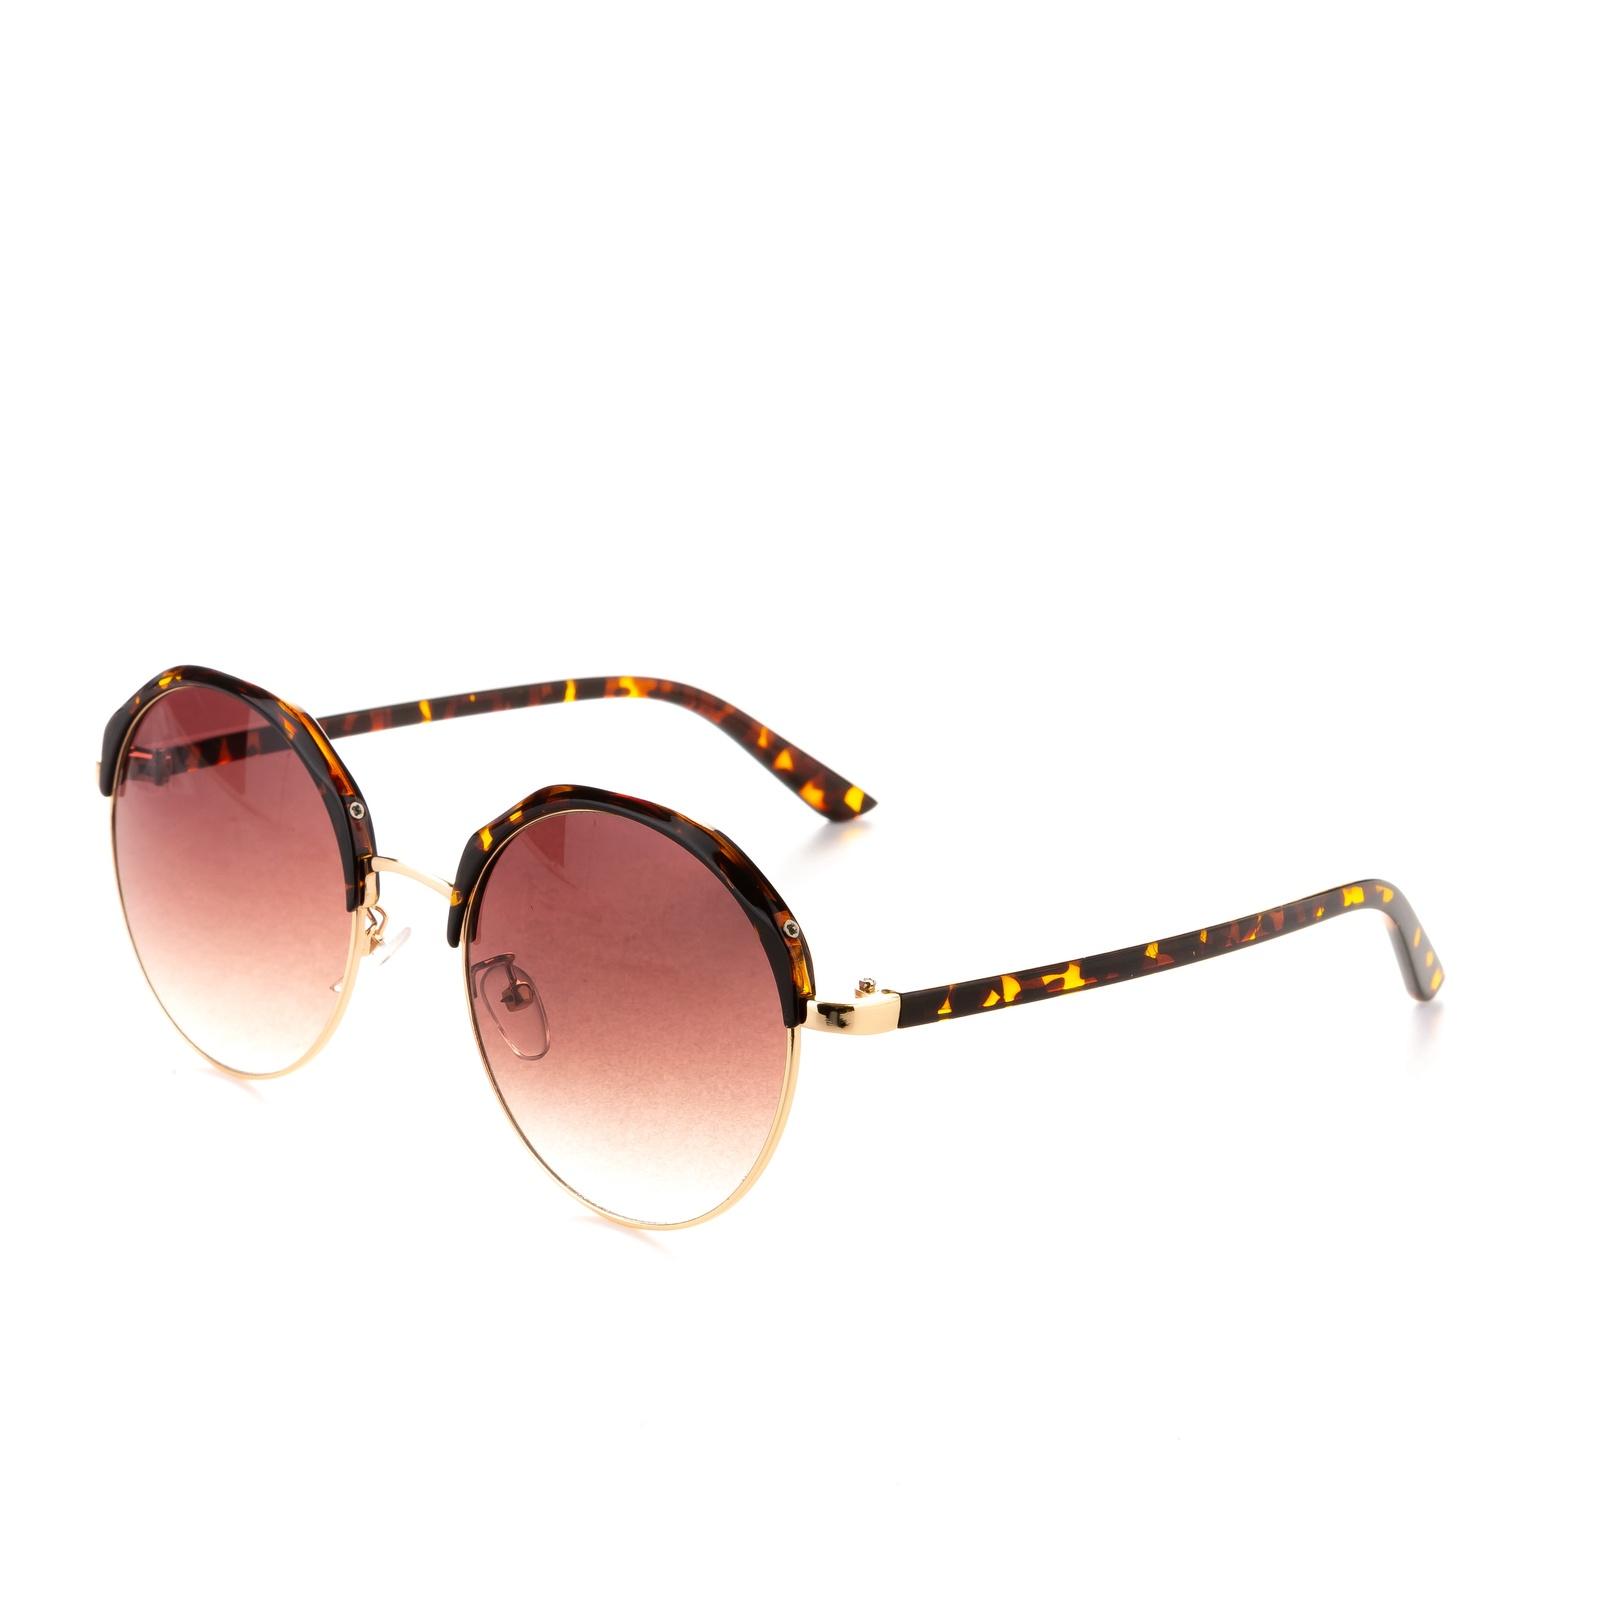 цена Очки солнцезащитные PrettyDay онлайн в 2017 году